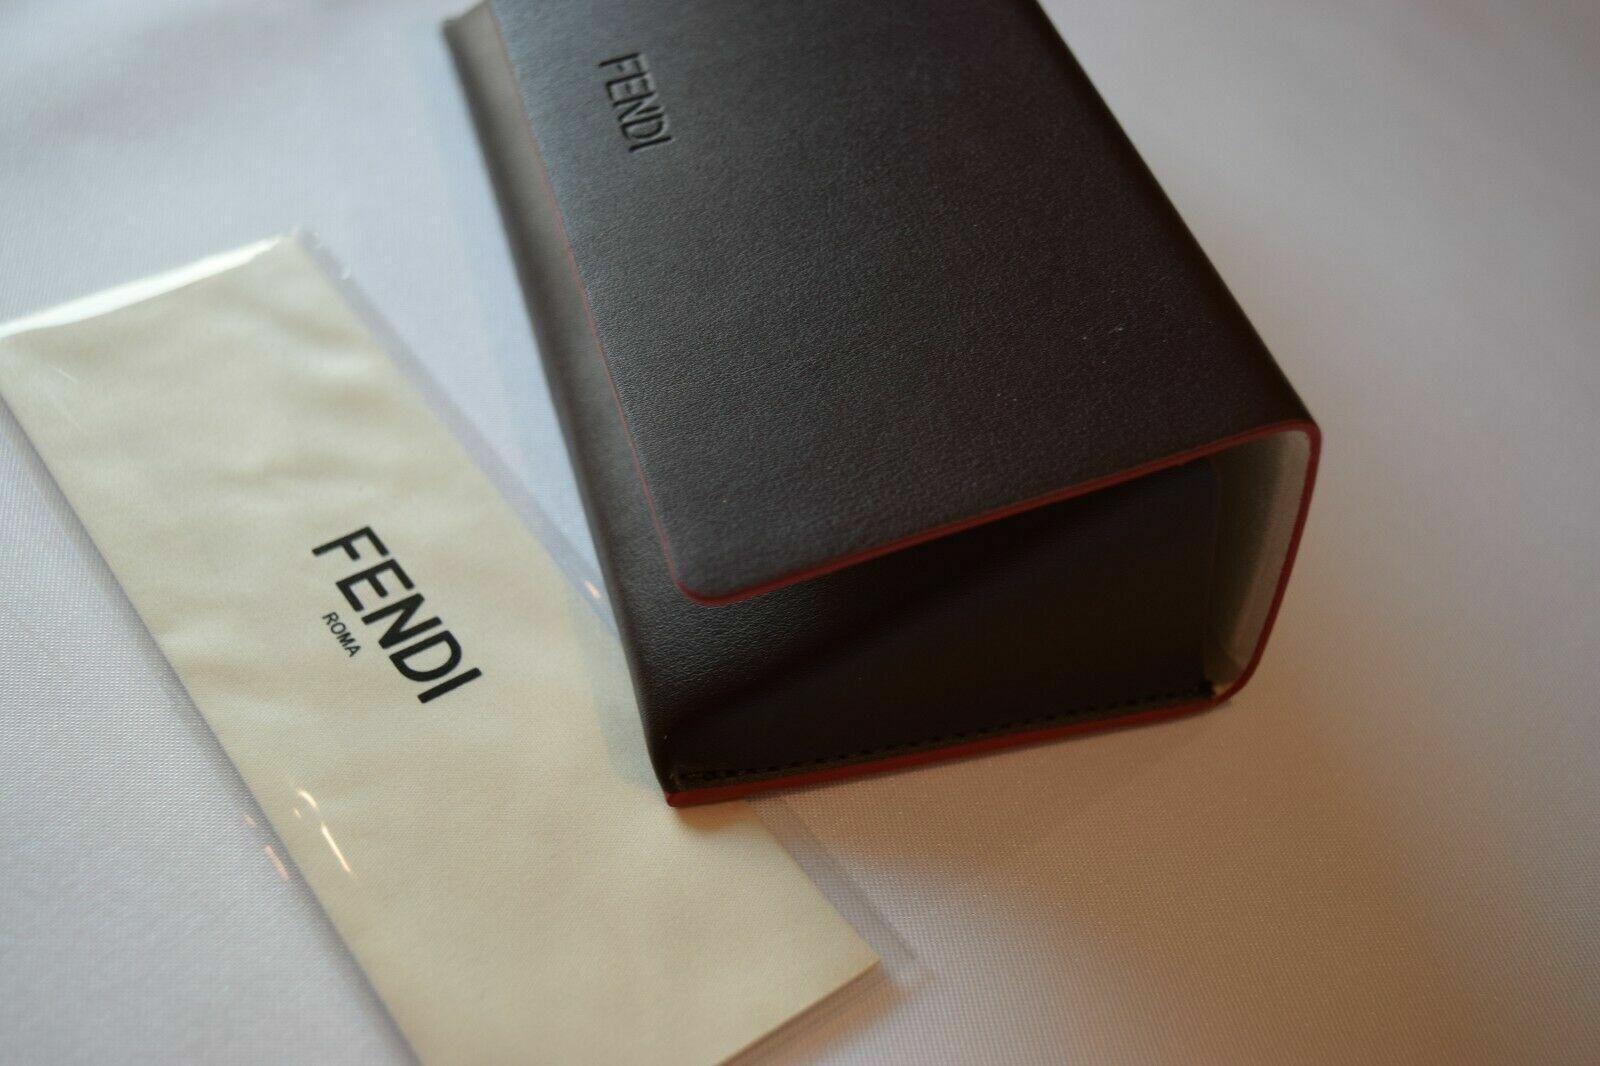 FENDI Leather Triangle Sunglass Case in Brown